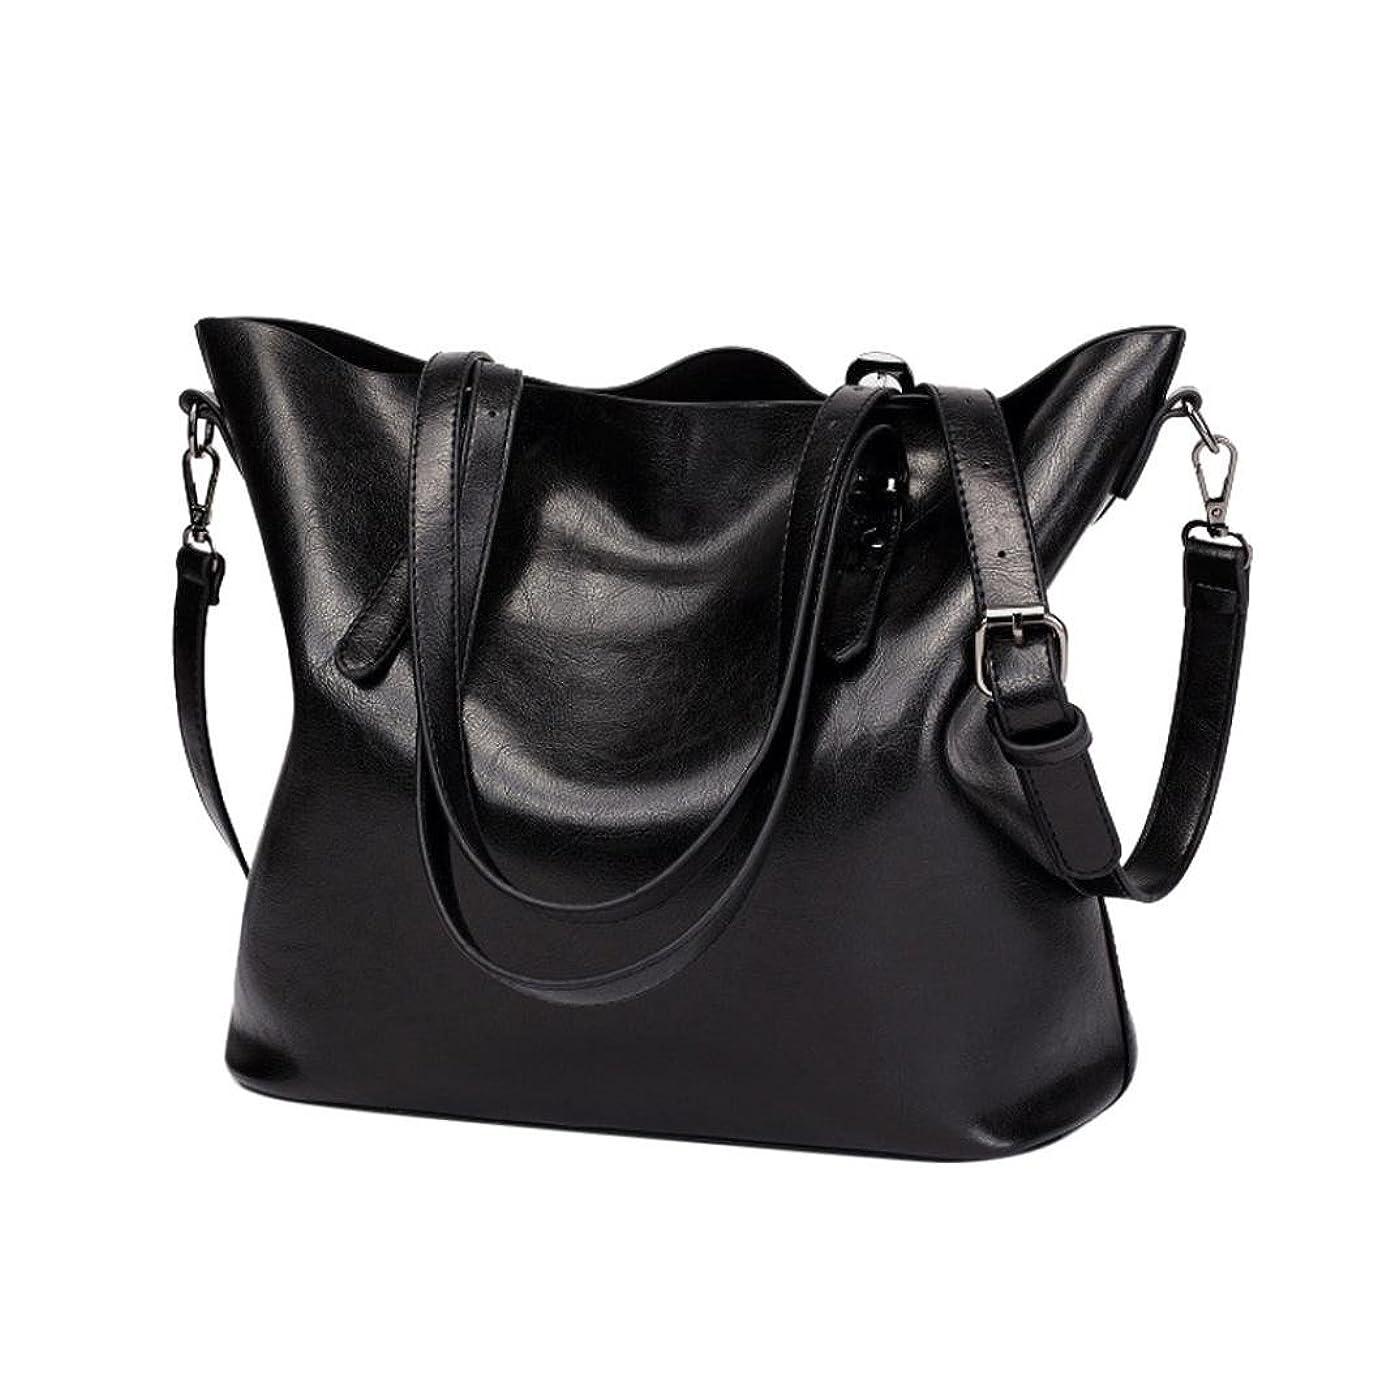 Clearance! Women Bucket Bags, Neartime Fashion Retro Crossbody Bag Shoulder Bag Handbag Versatile Tote Messenger Bags (??32cm(L)×12cm(W)×29.5cm(H), Black) gwm3990826